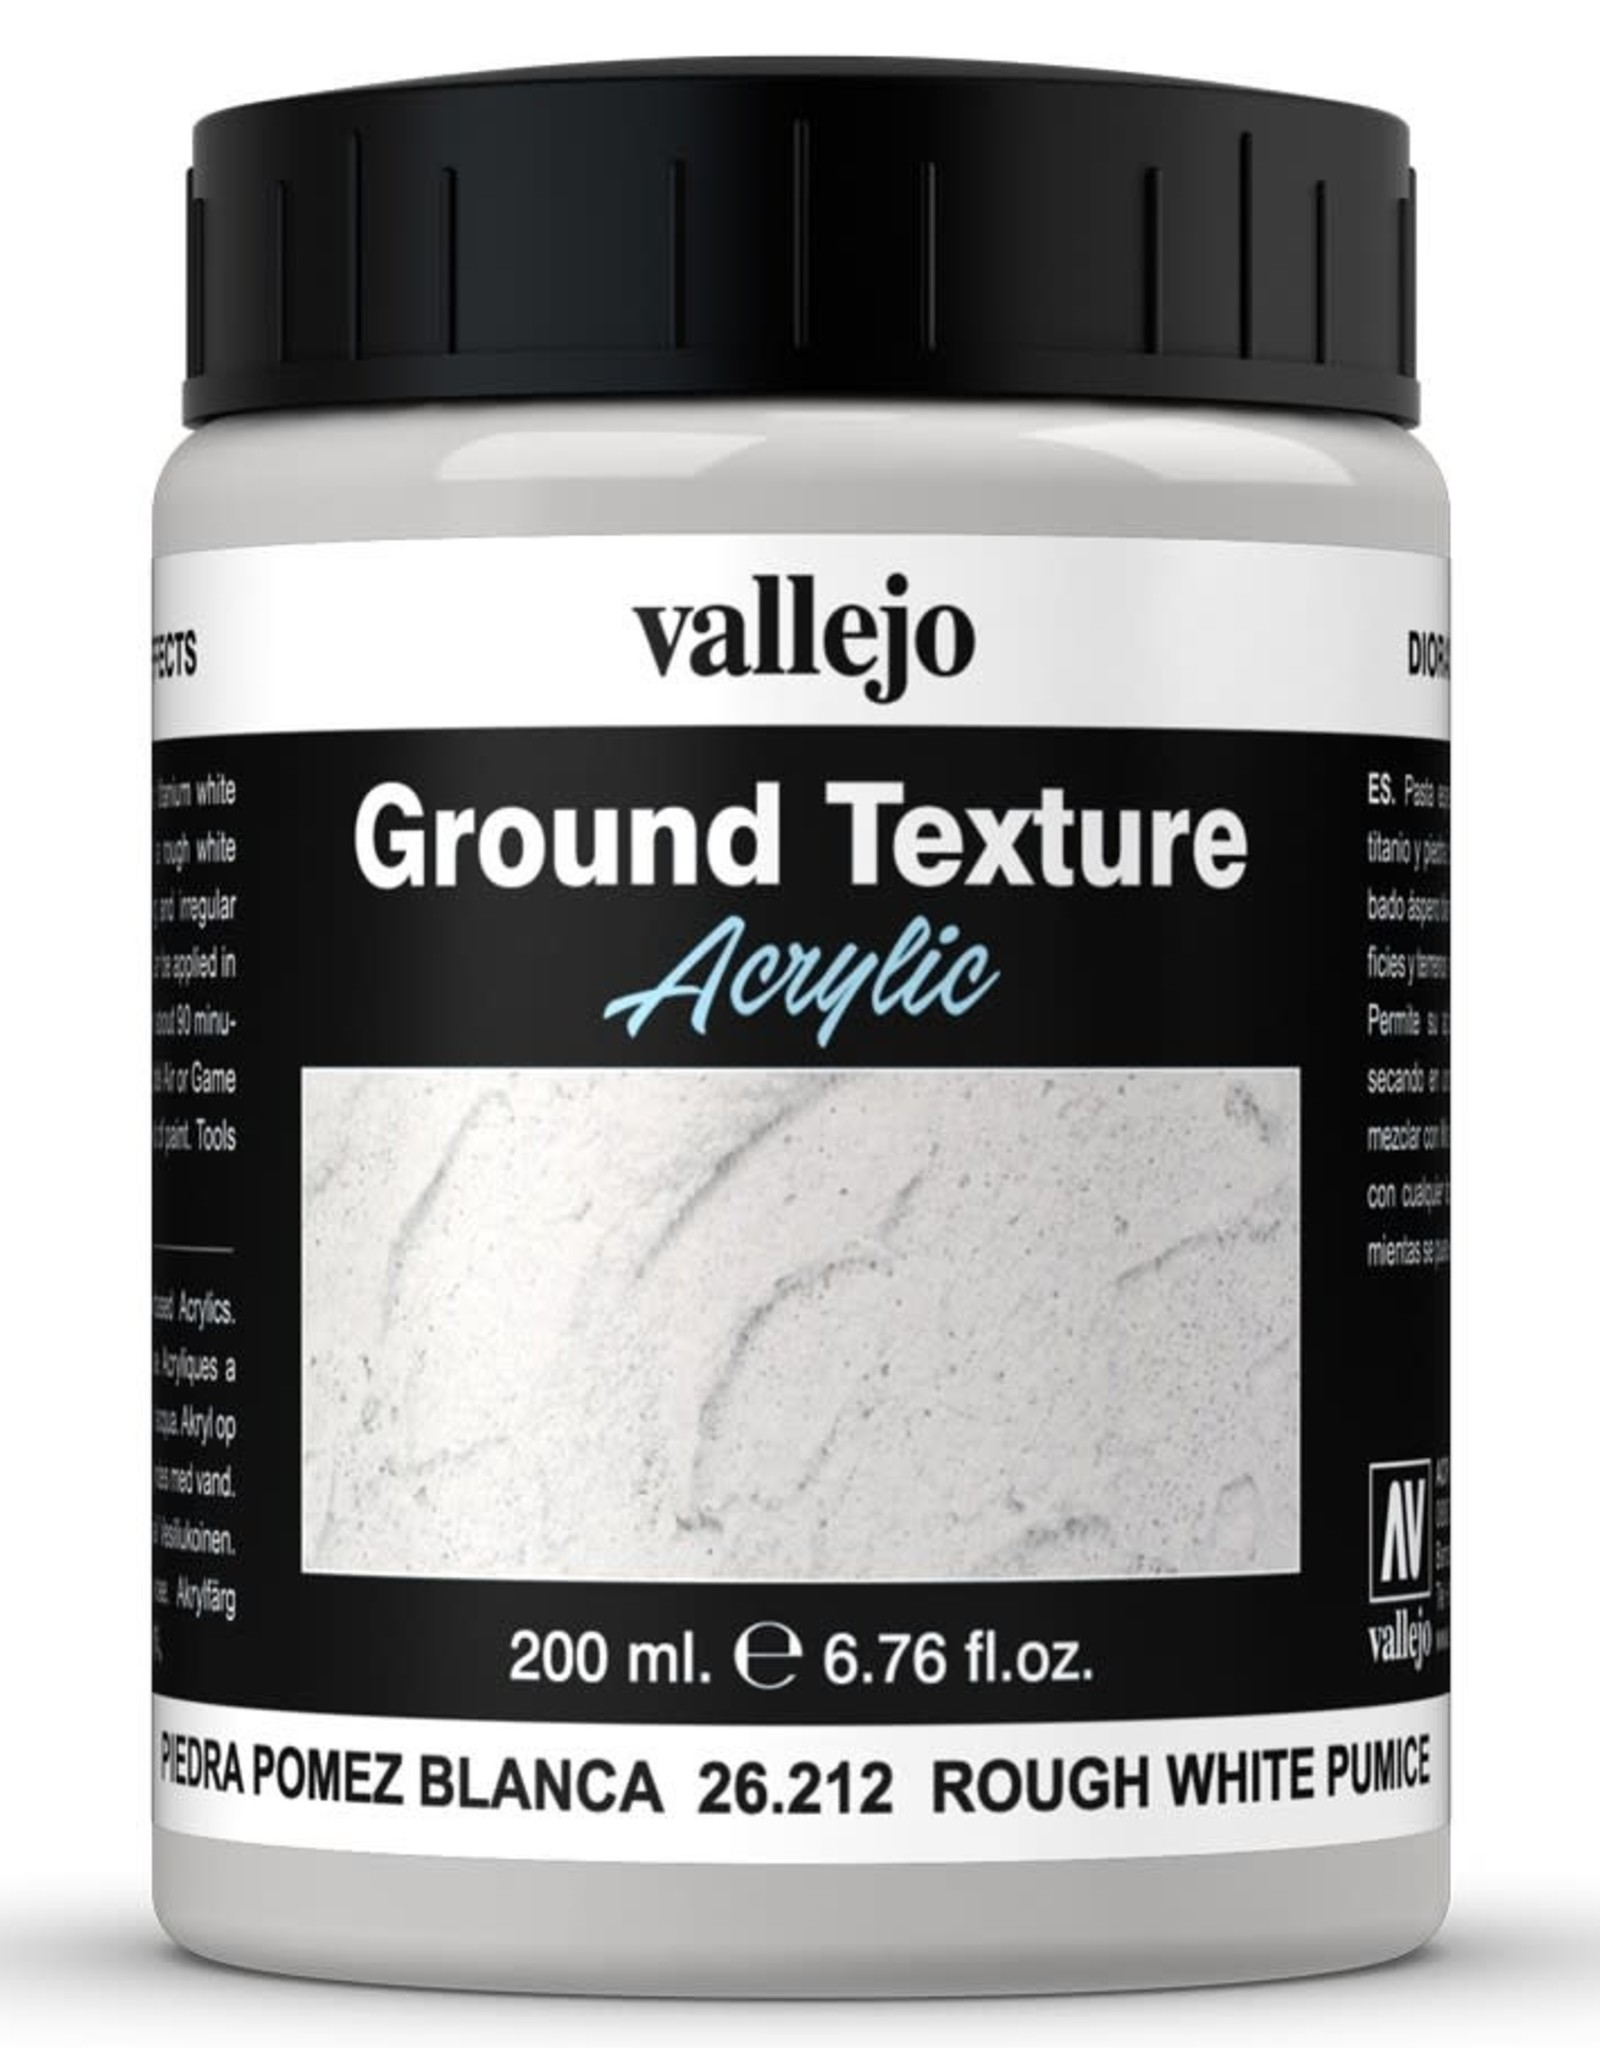 Vallejo Diorama Effects: Ground Texture - Rough White Pumice